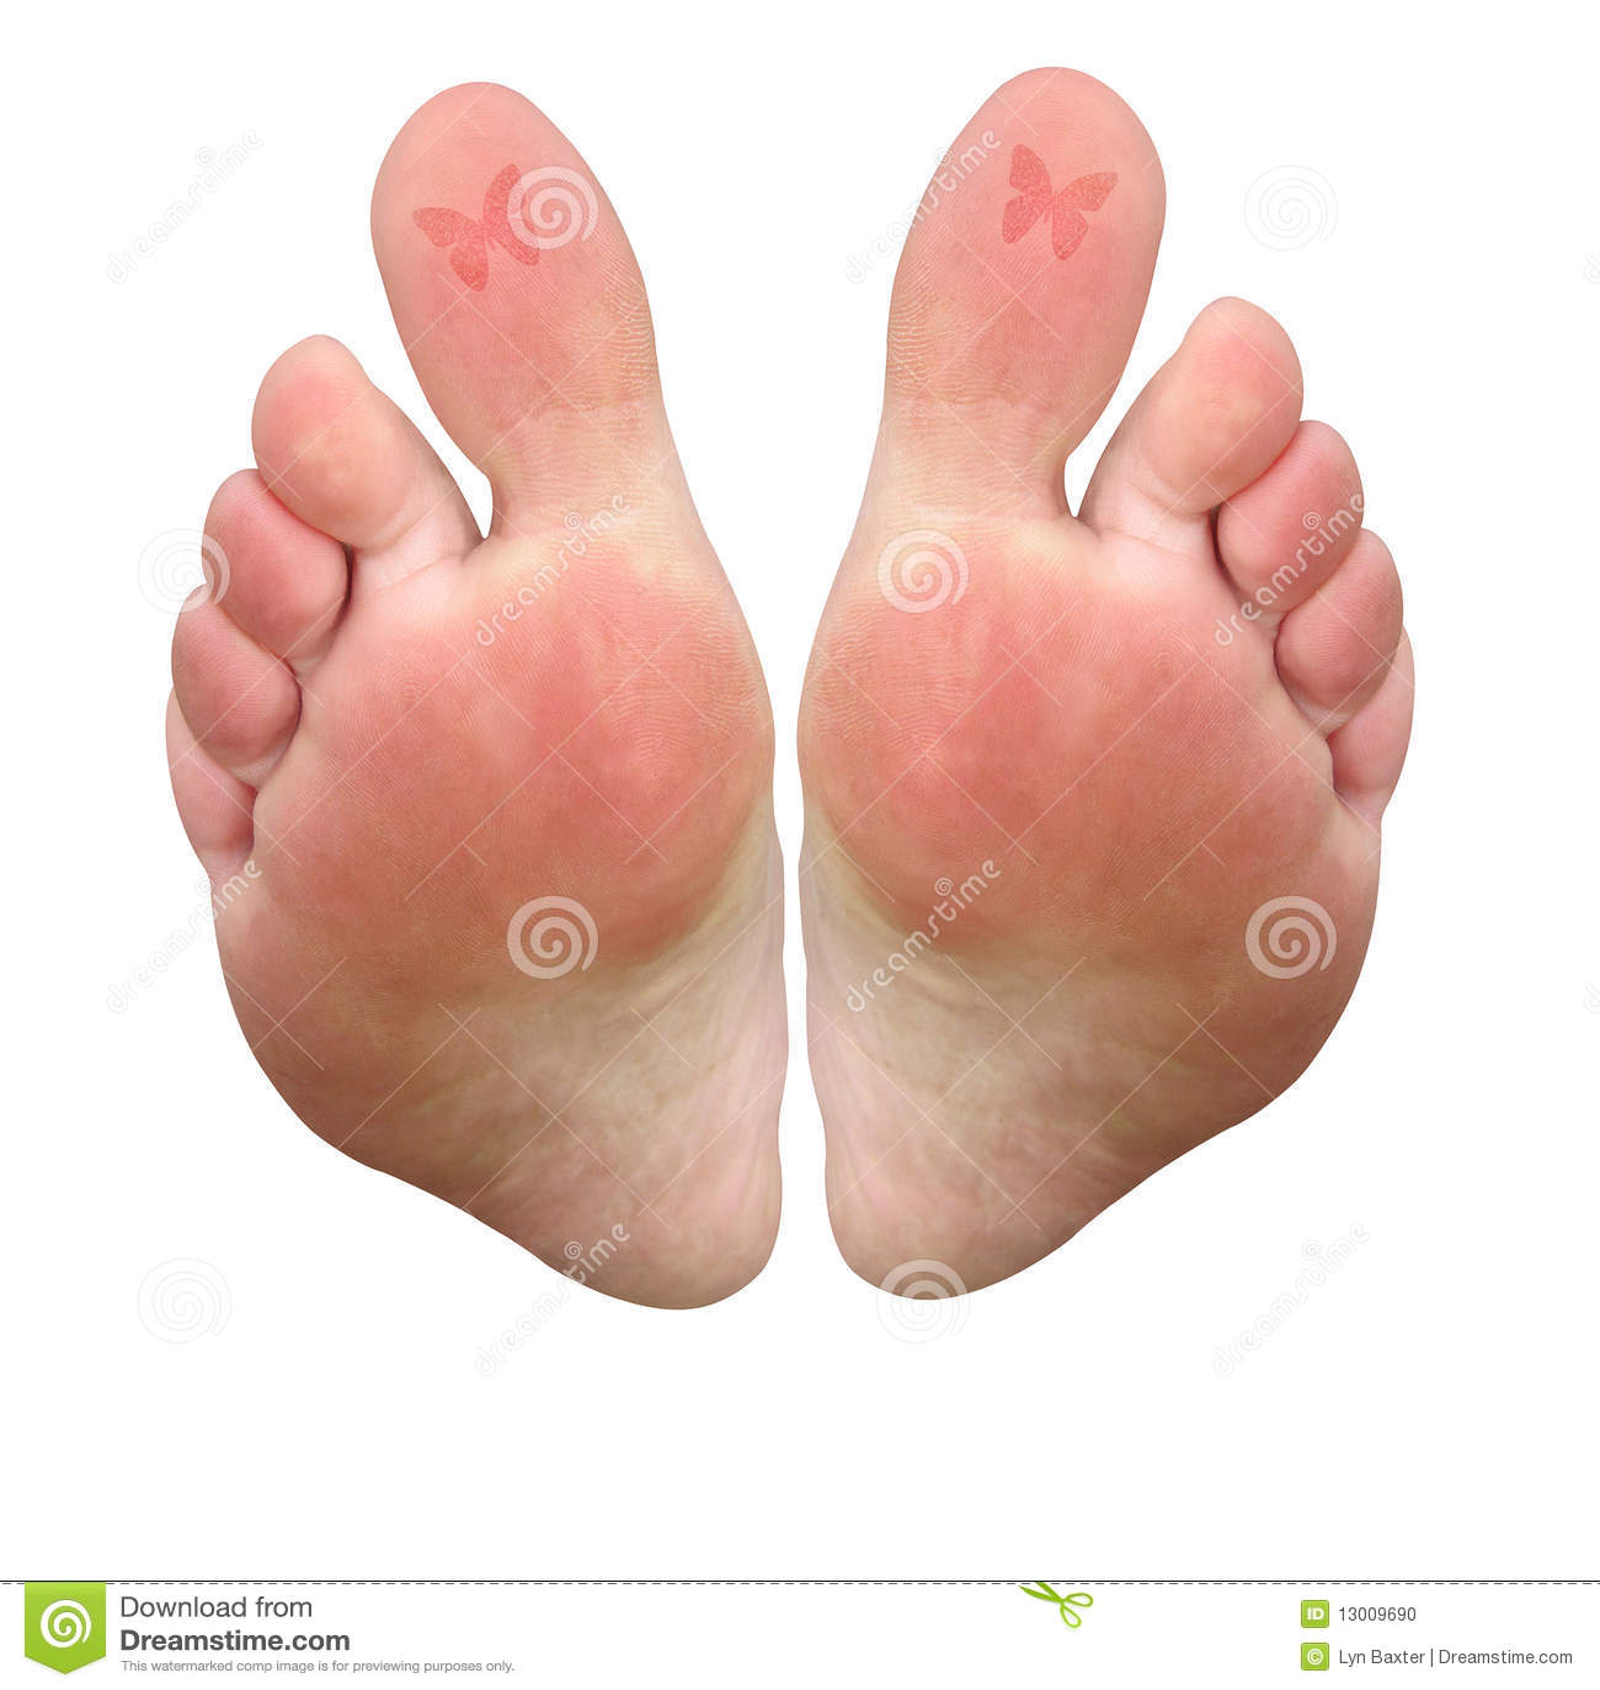 Tatuaży motyli palec u nogi